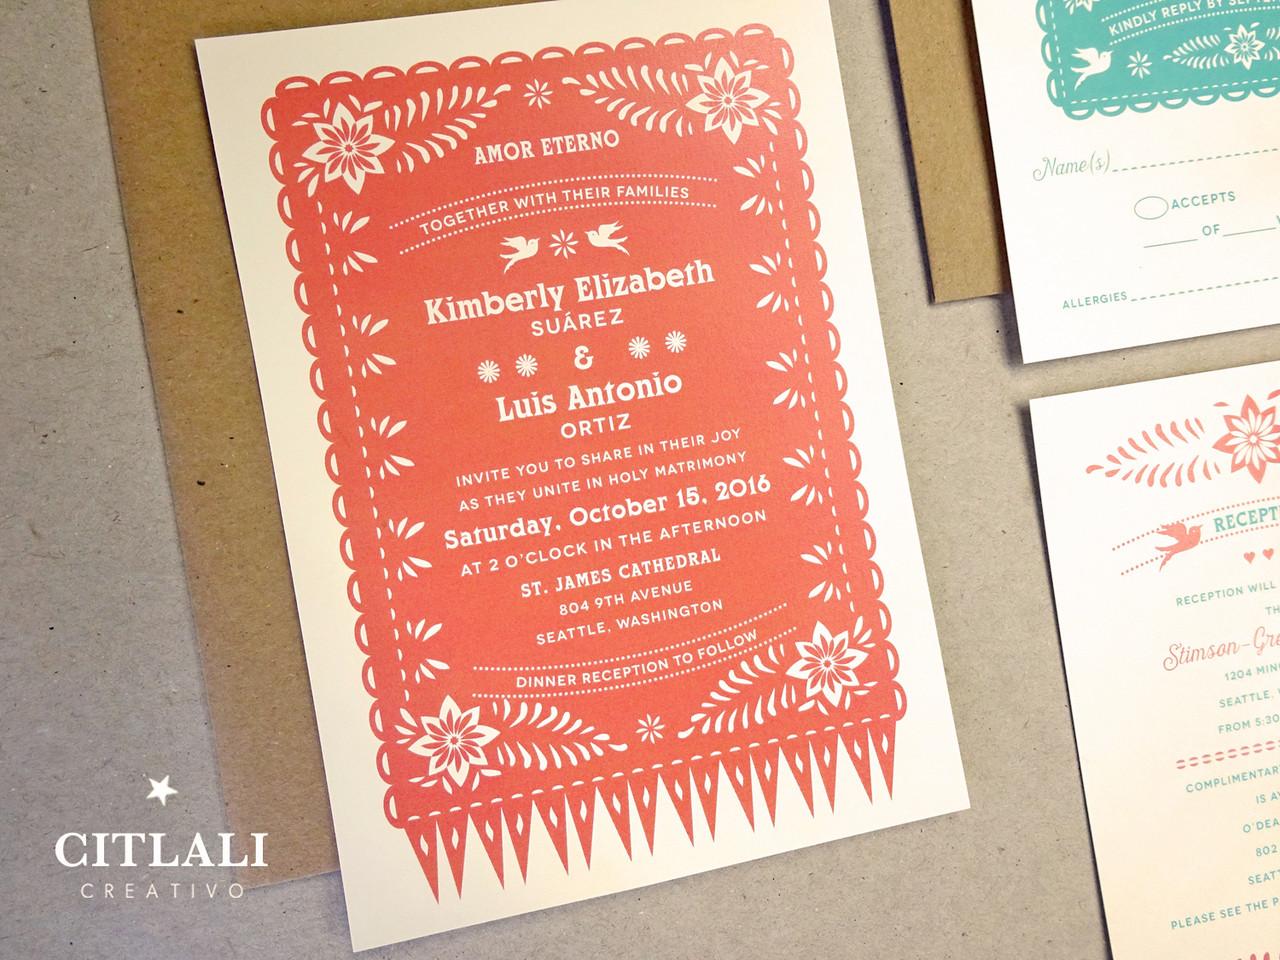 Coral Papel Picado Mexico Destination or Themed Wedding – Calligraphy Stencils for Wedding Invitations